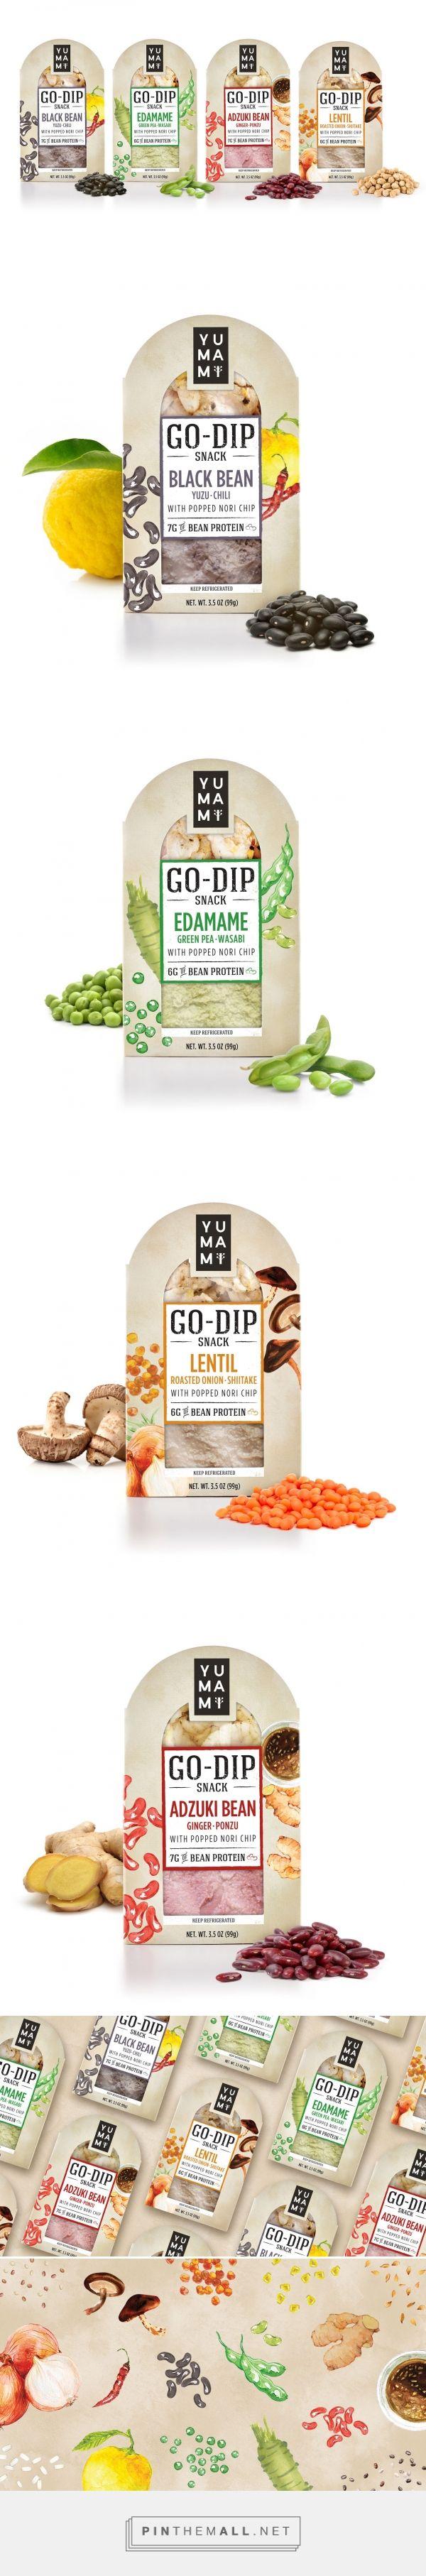 Yumami Go-Dip Snacks - Packaging of the World - Creative Package Design Gallery - http://www.packagingoftheworld.com/2017/06/yumami-go-dip.html - created via https://pinthemall.net